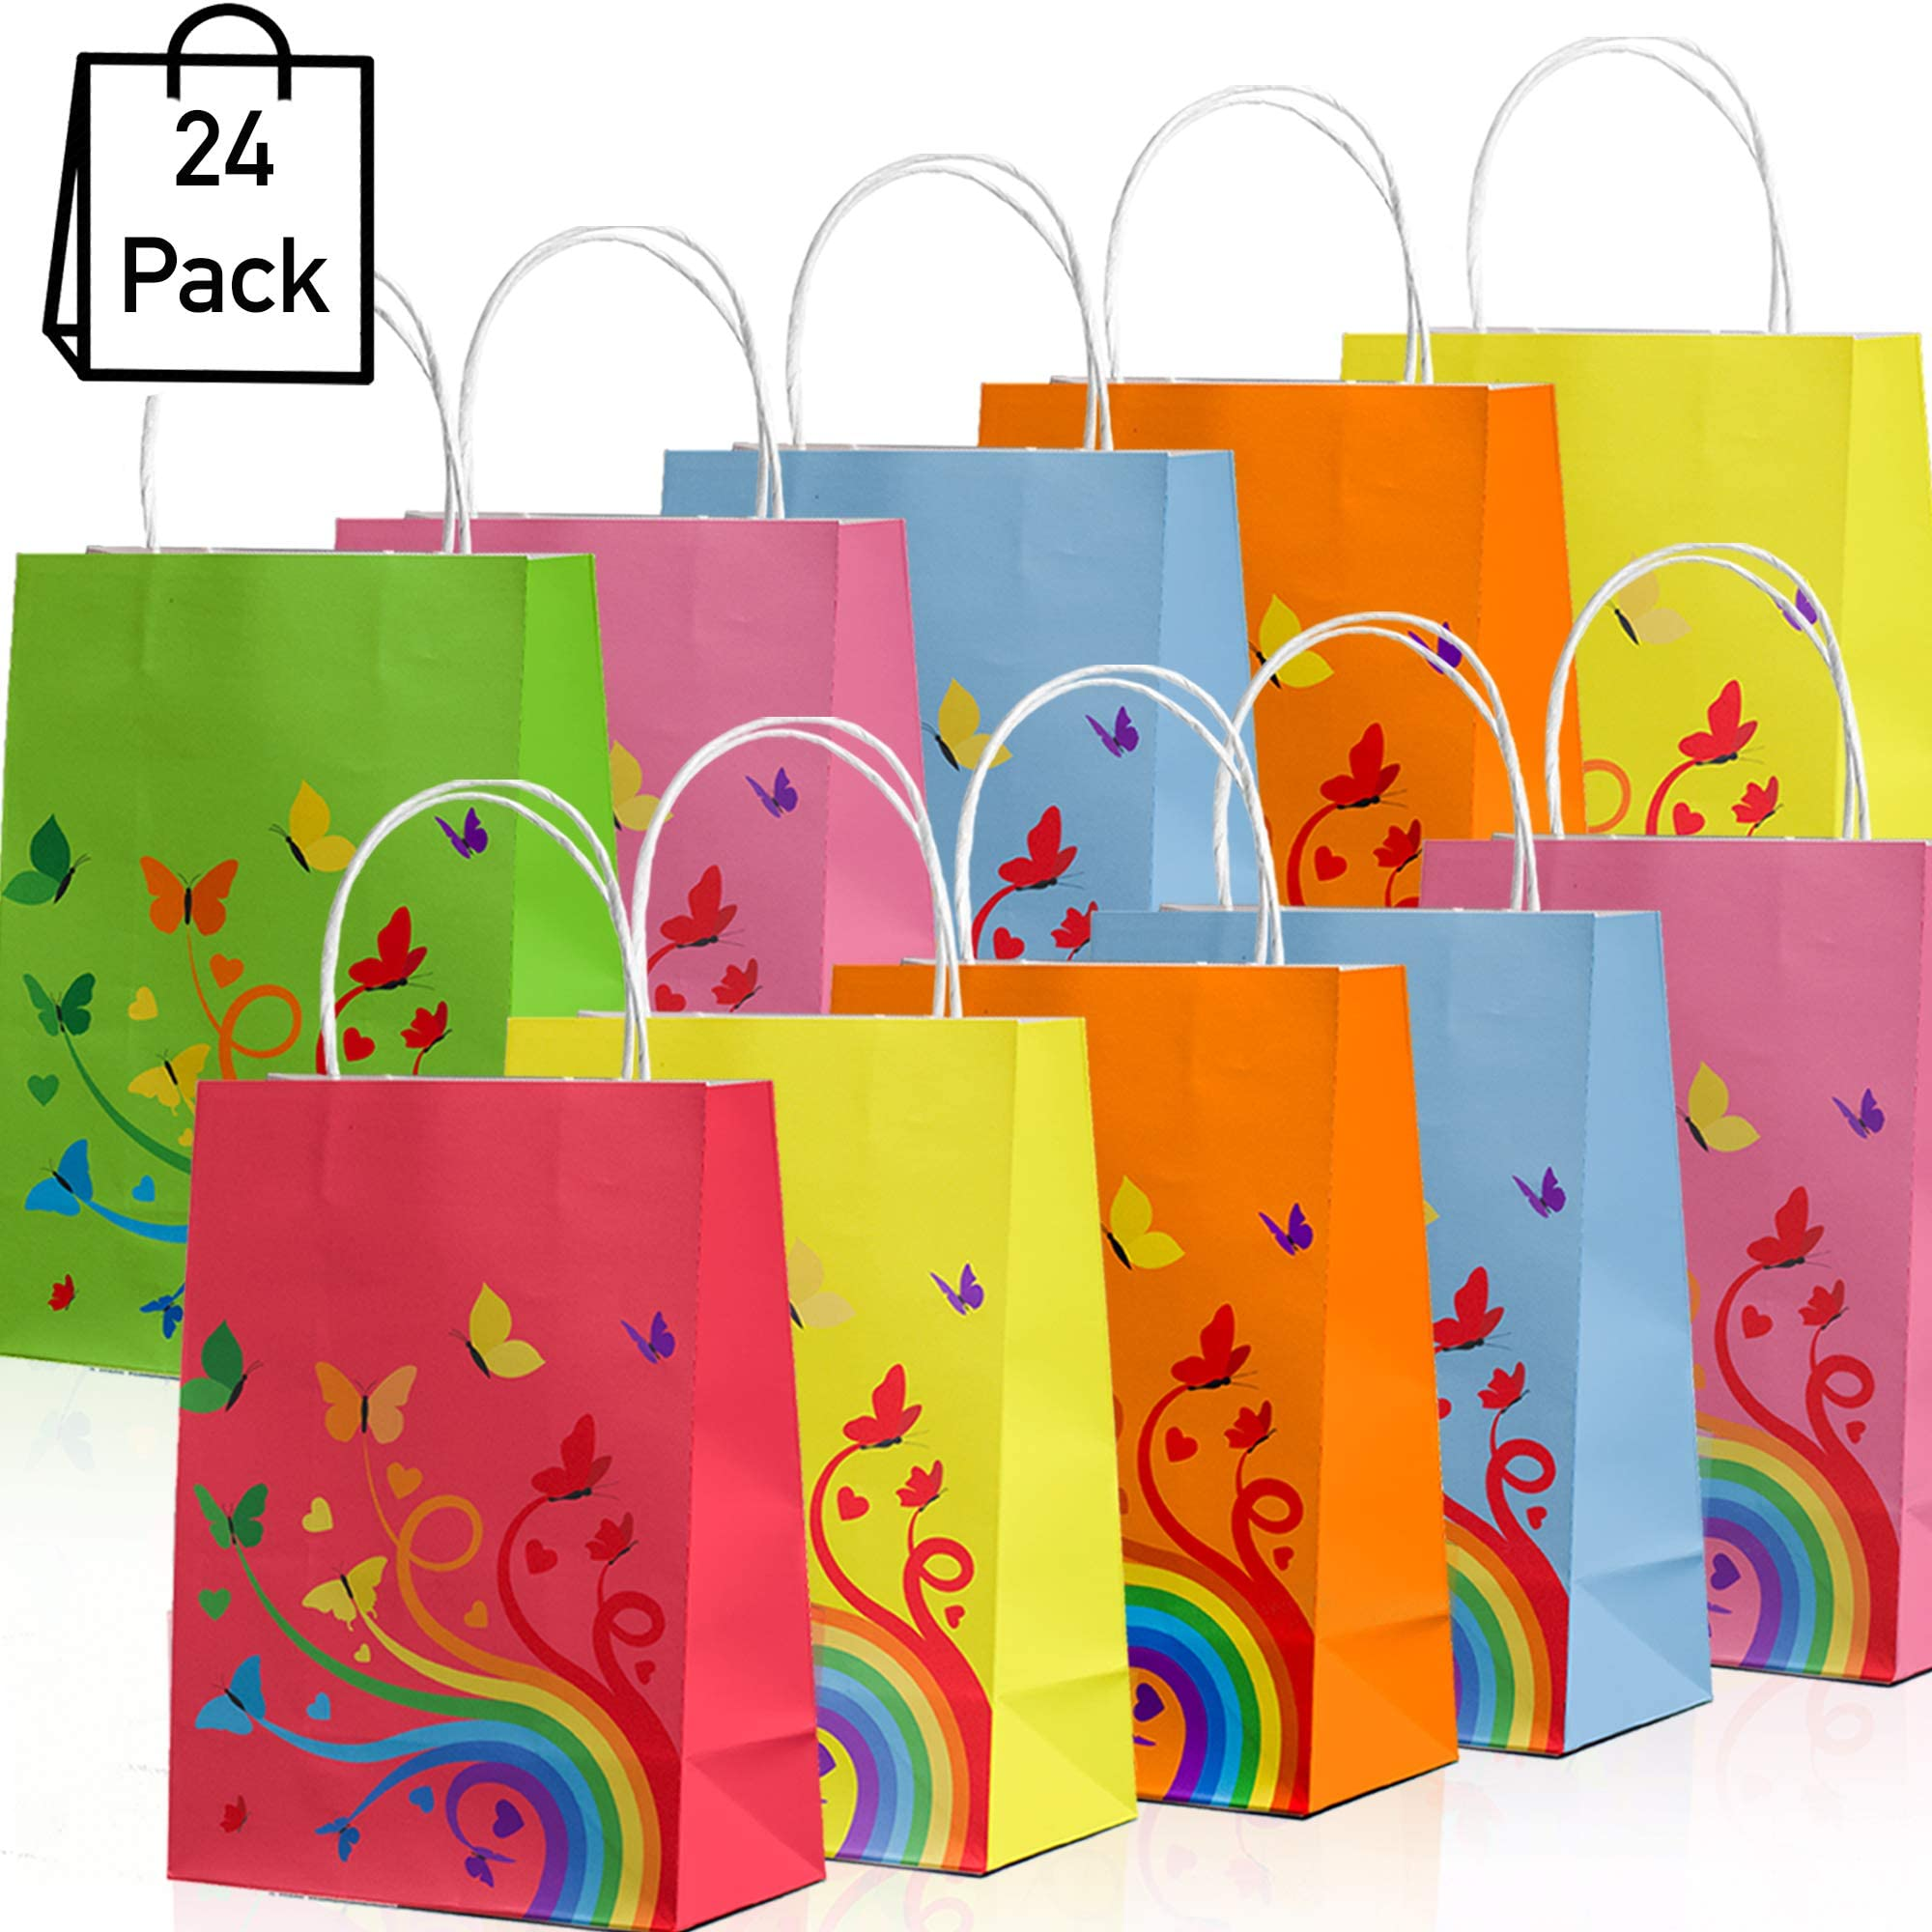 rainbow theme party bag book plastic free party rainbow party bag filler x 5 RAINBOW ACTIVITY BOOK rainbow party rainbow book